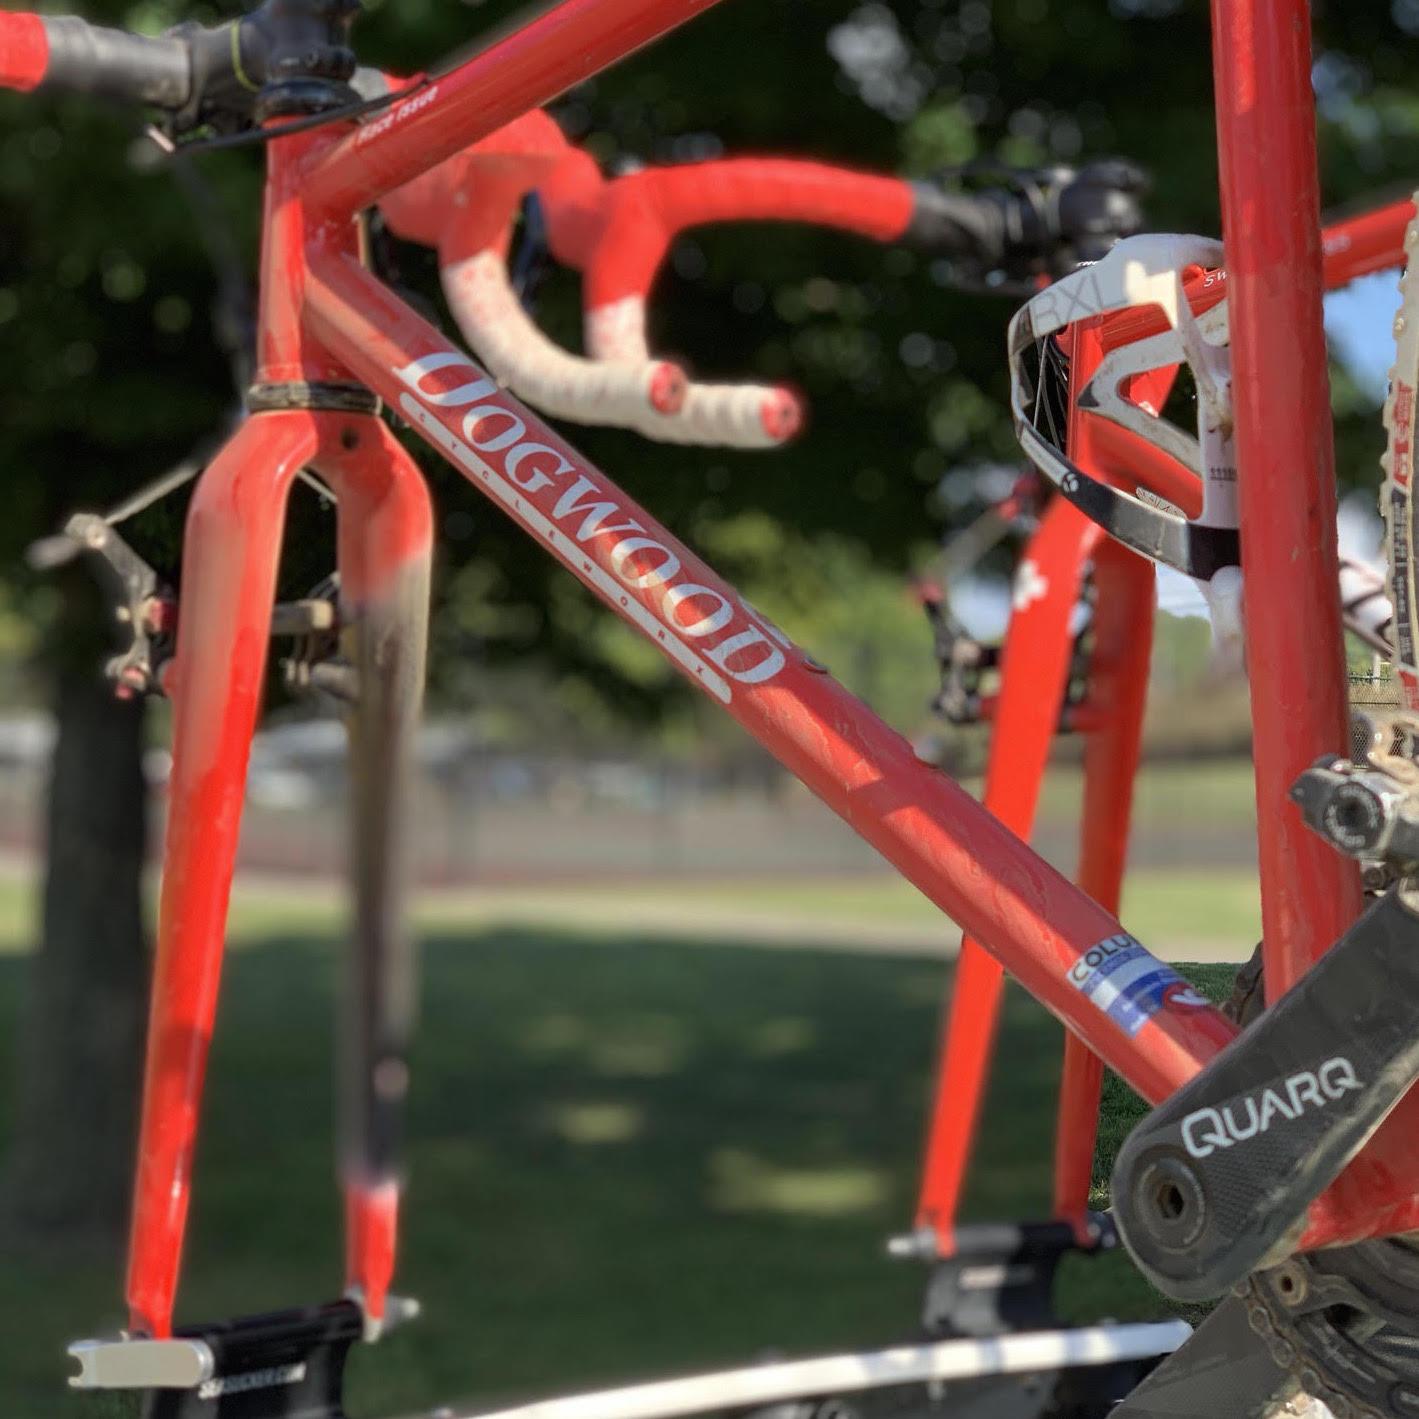 Dogwood-Cycleworx-cyclecross-steel-custom-bicycle--red.jpg